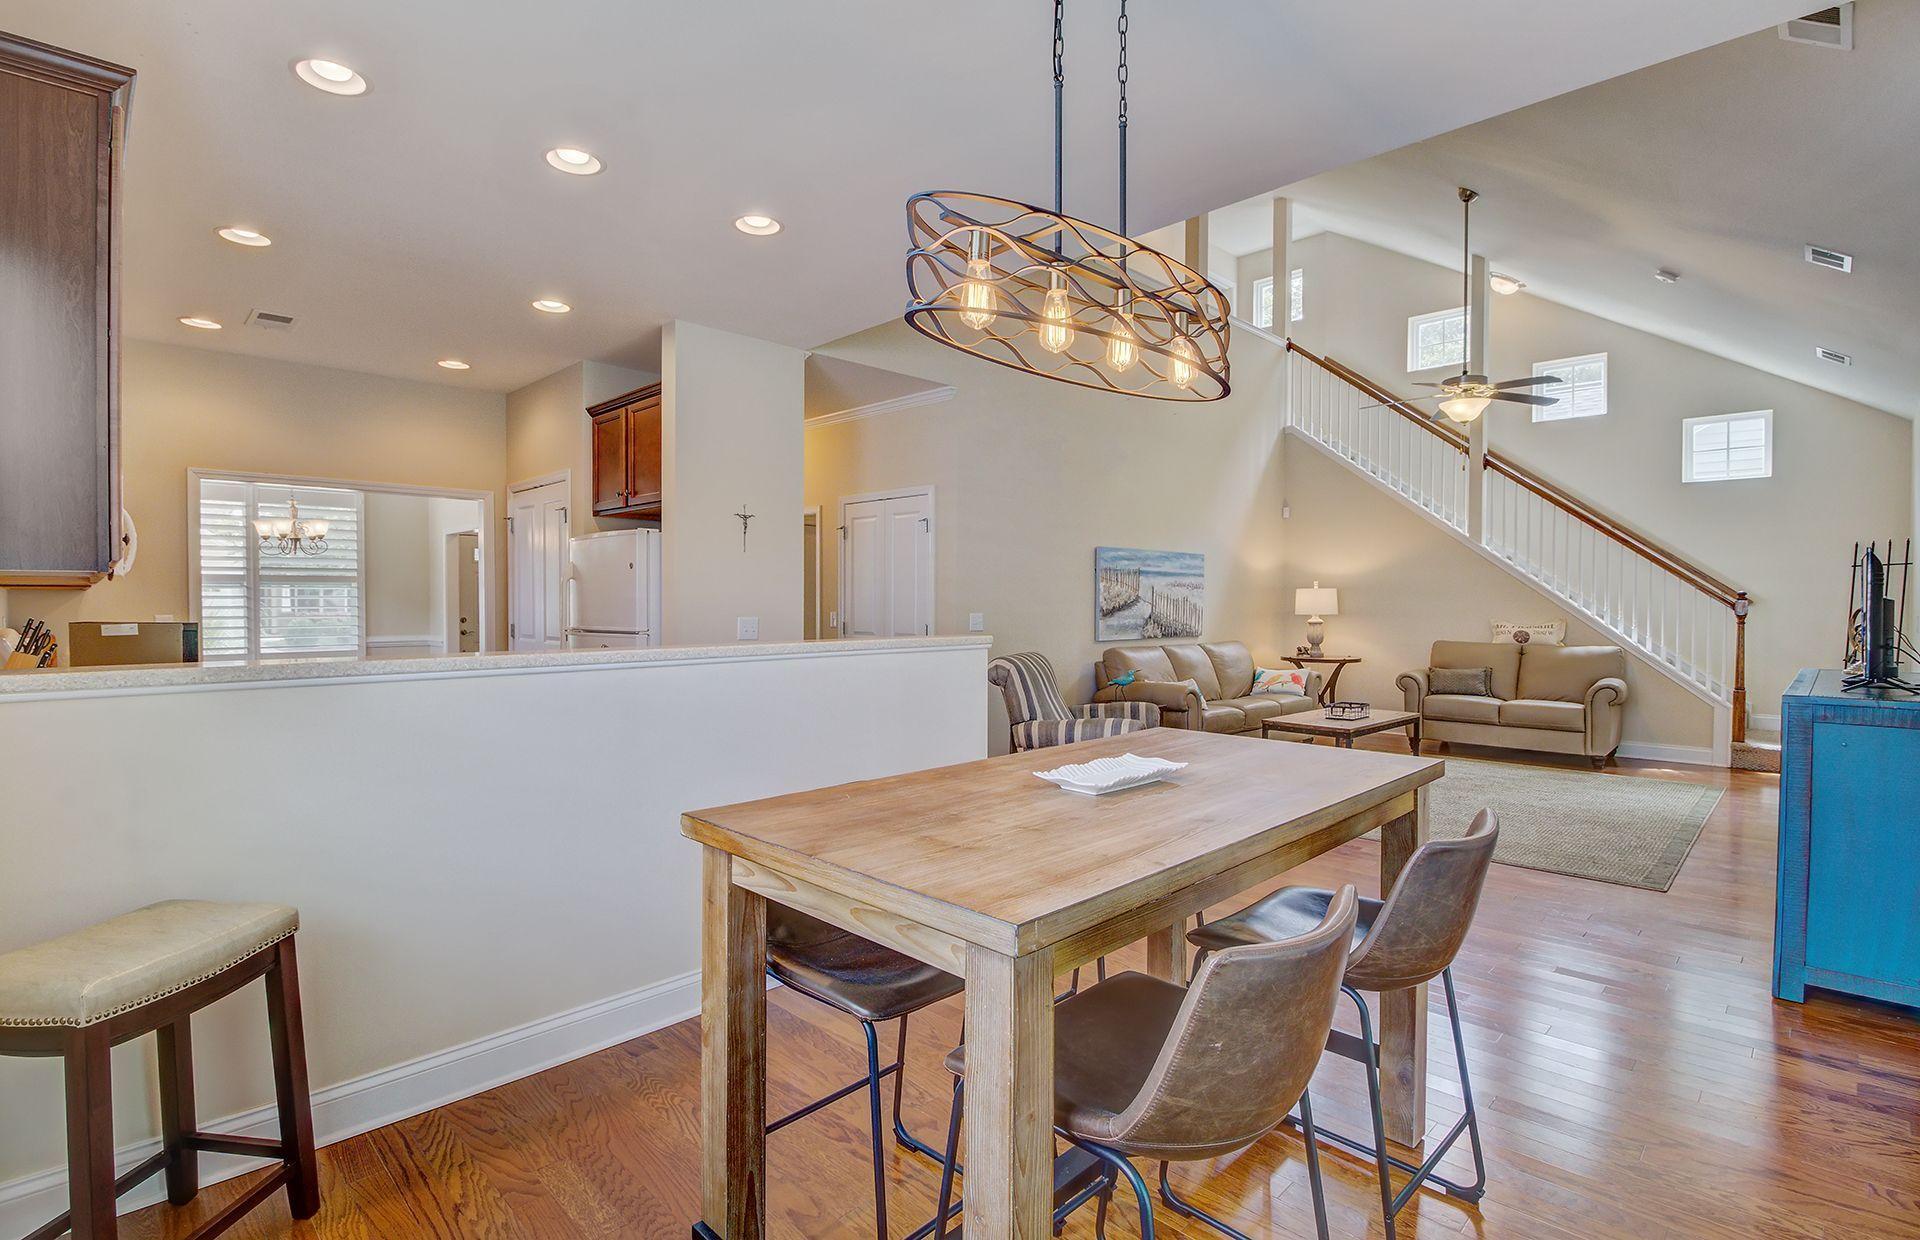 Linnen Place Homes For Sale - 1275 Shingleback, Mount Pleasant, SC - 21